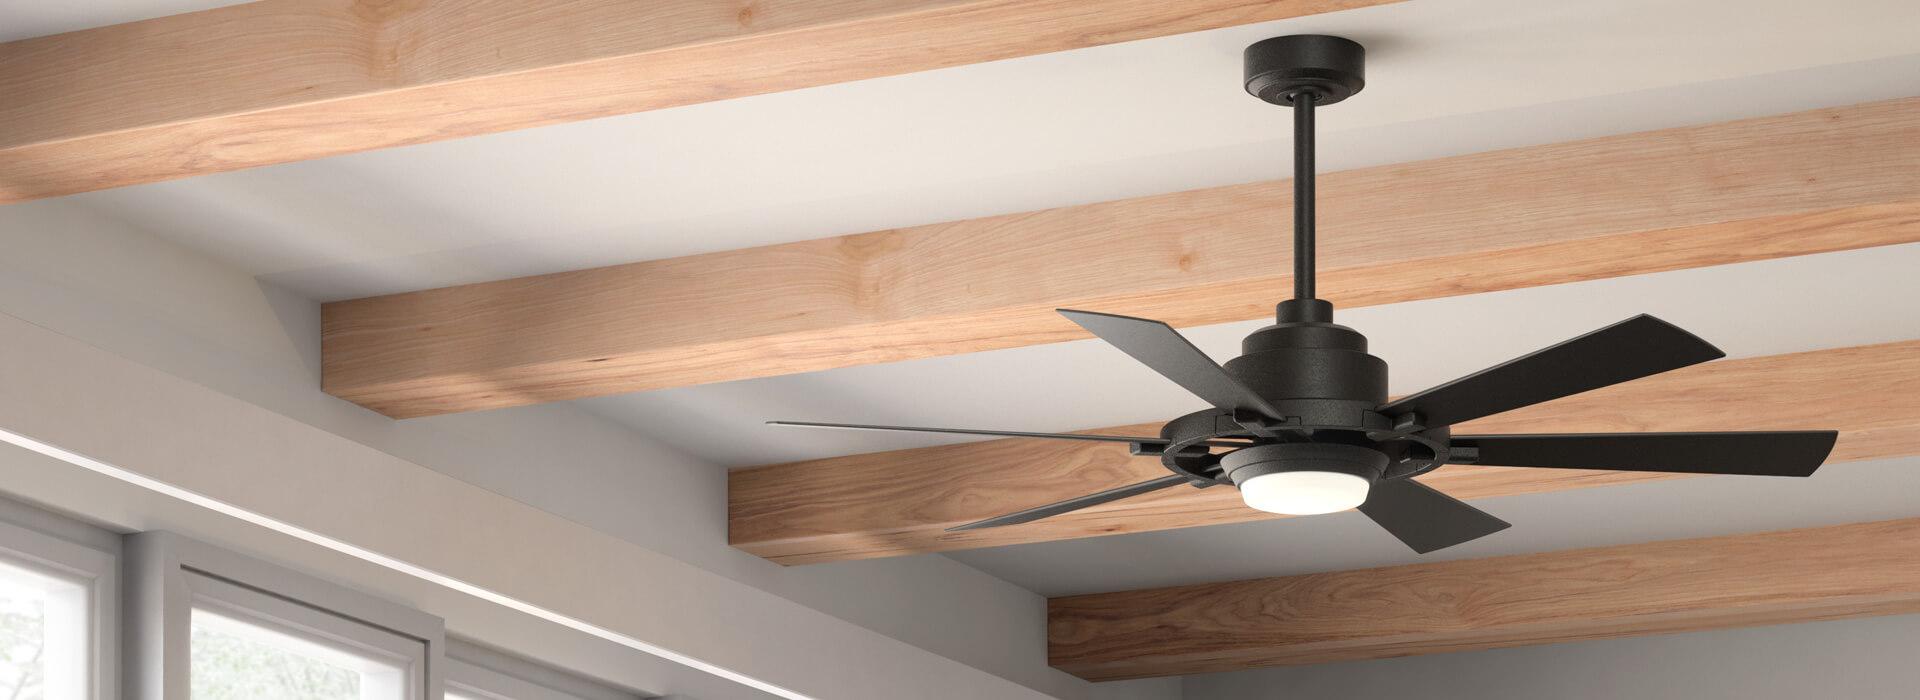 Ceiling Fan Kichler Lighting